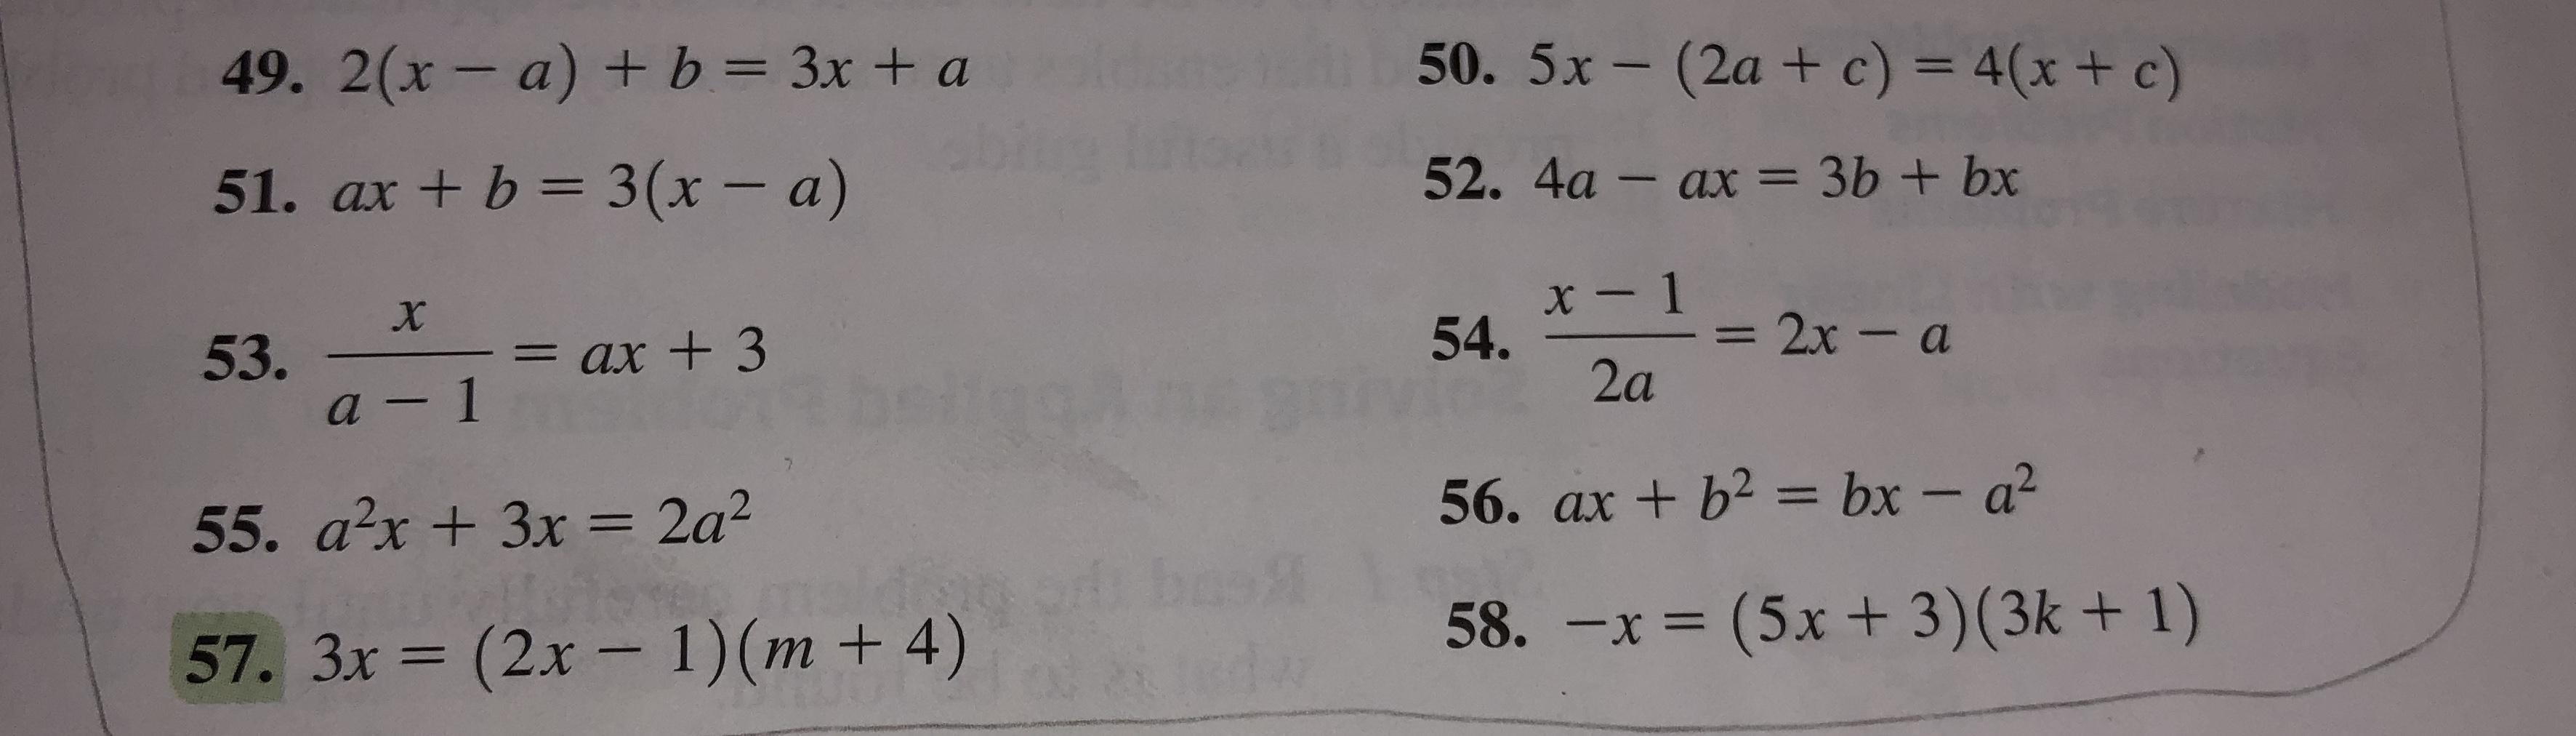 50. 5x-(2a + c) = 4(x + c) 49. 2(x- a) + b = 3x + a 52. 4a - ax = 3b + bx 51. ax + b 3 (x - a) x- 1 54. 2x-a 53. a-1 = ax +3 2a 56. ax +b2 bx - a2 55. a2x+3x = 2a2 58. -x = (5x+ 3)(3k + 1) (2x- 1)(m + 4) 57. 3x (3